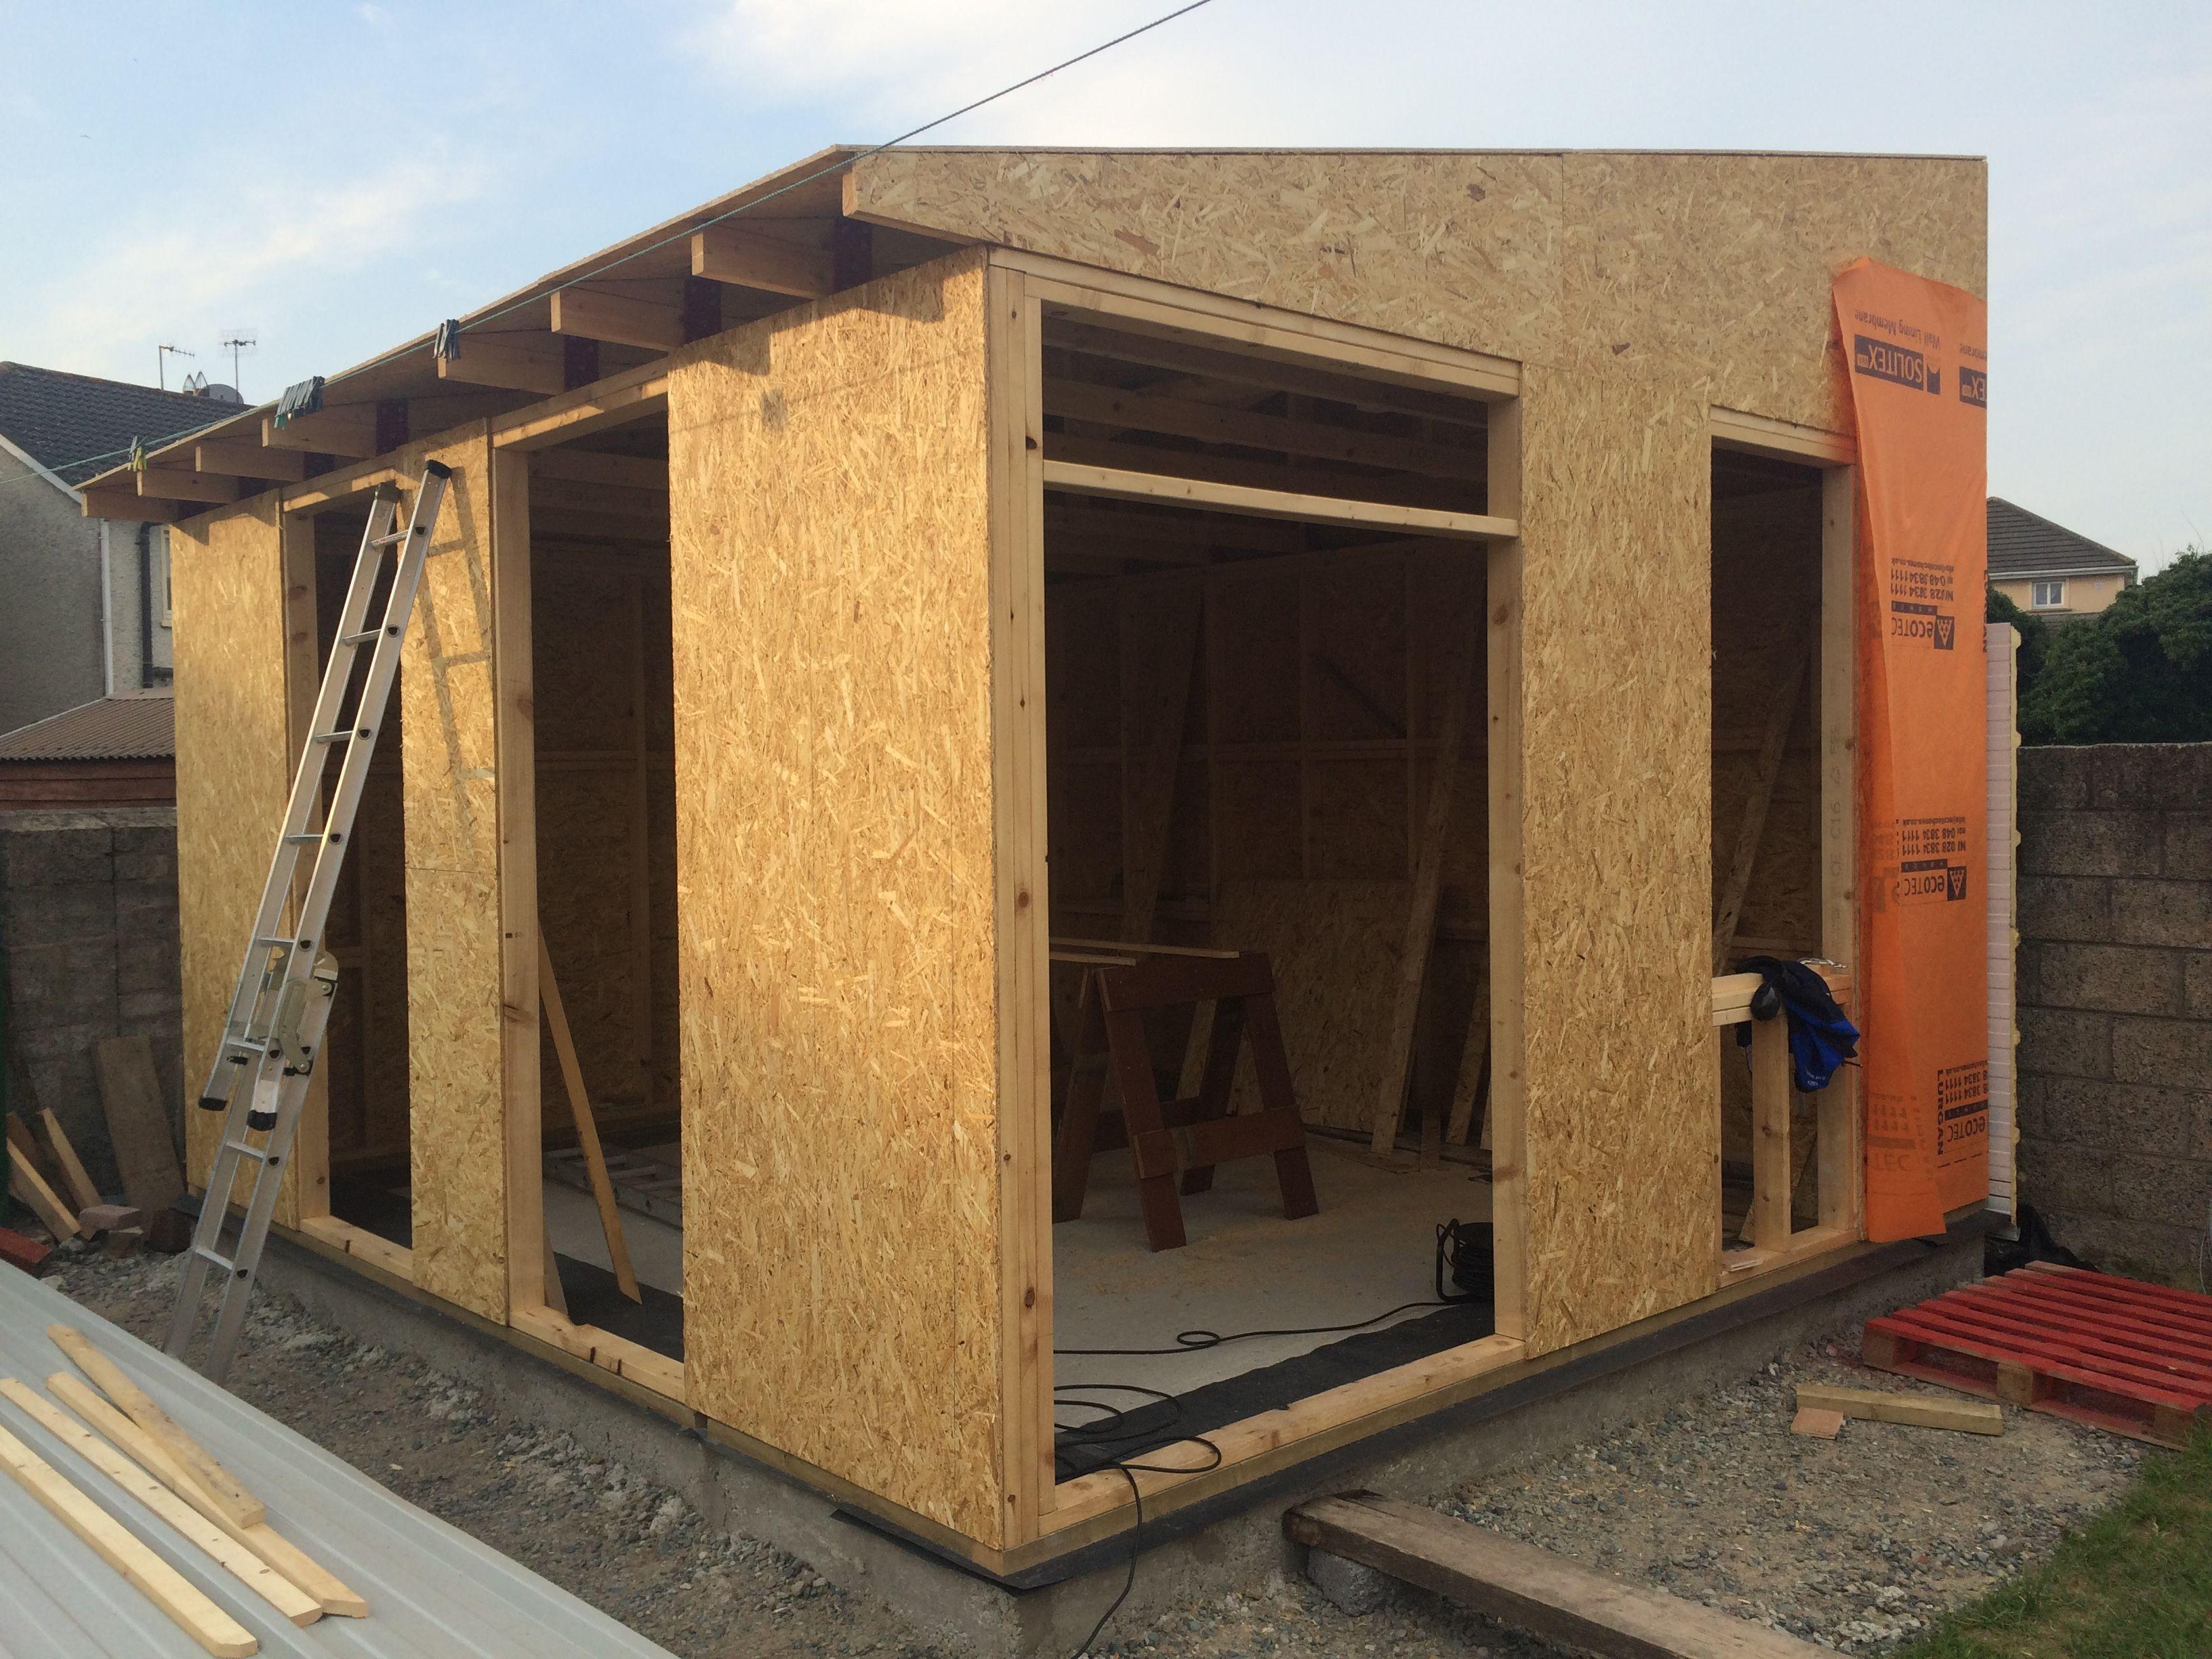 Superior Workshop Construction, Timber Frame, OSB Sheeting, Monopitch Roof.